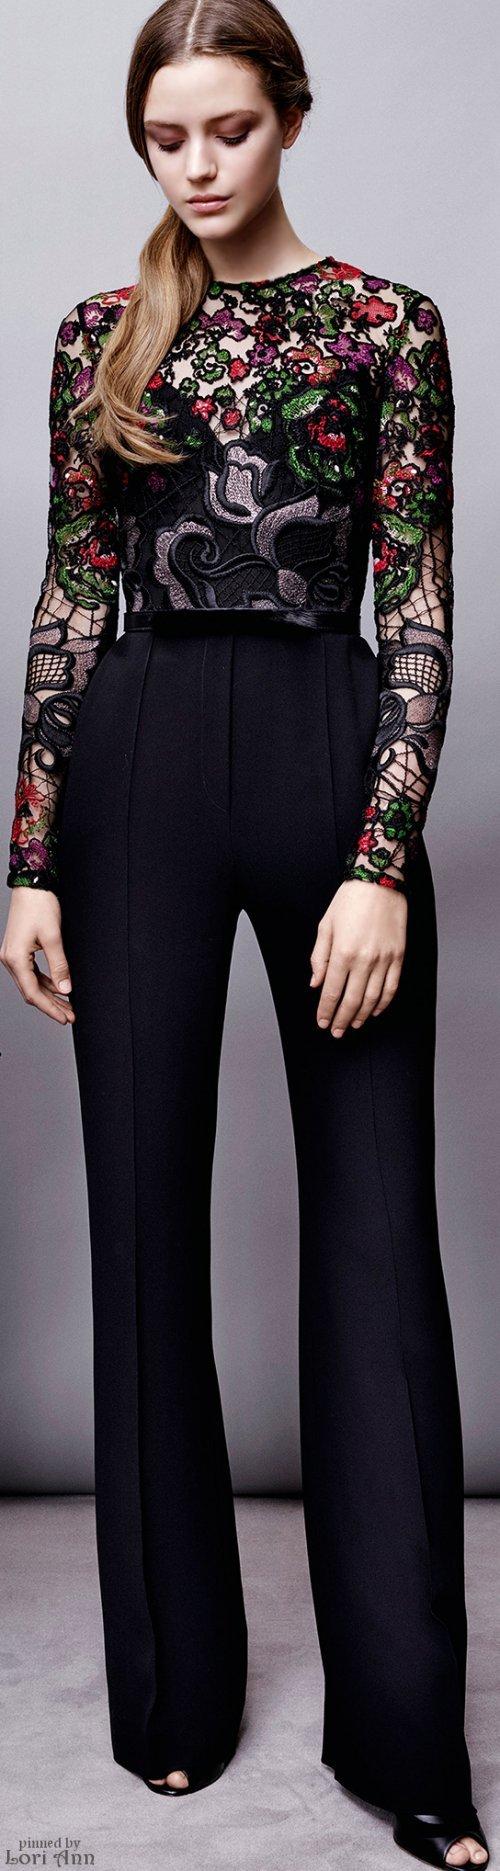 elie saab prefall 2015 fashion show macaco estilo e